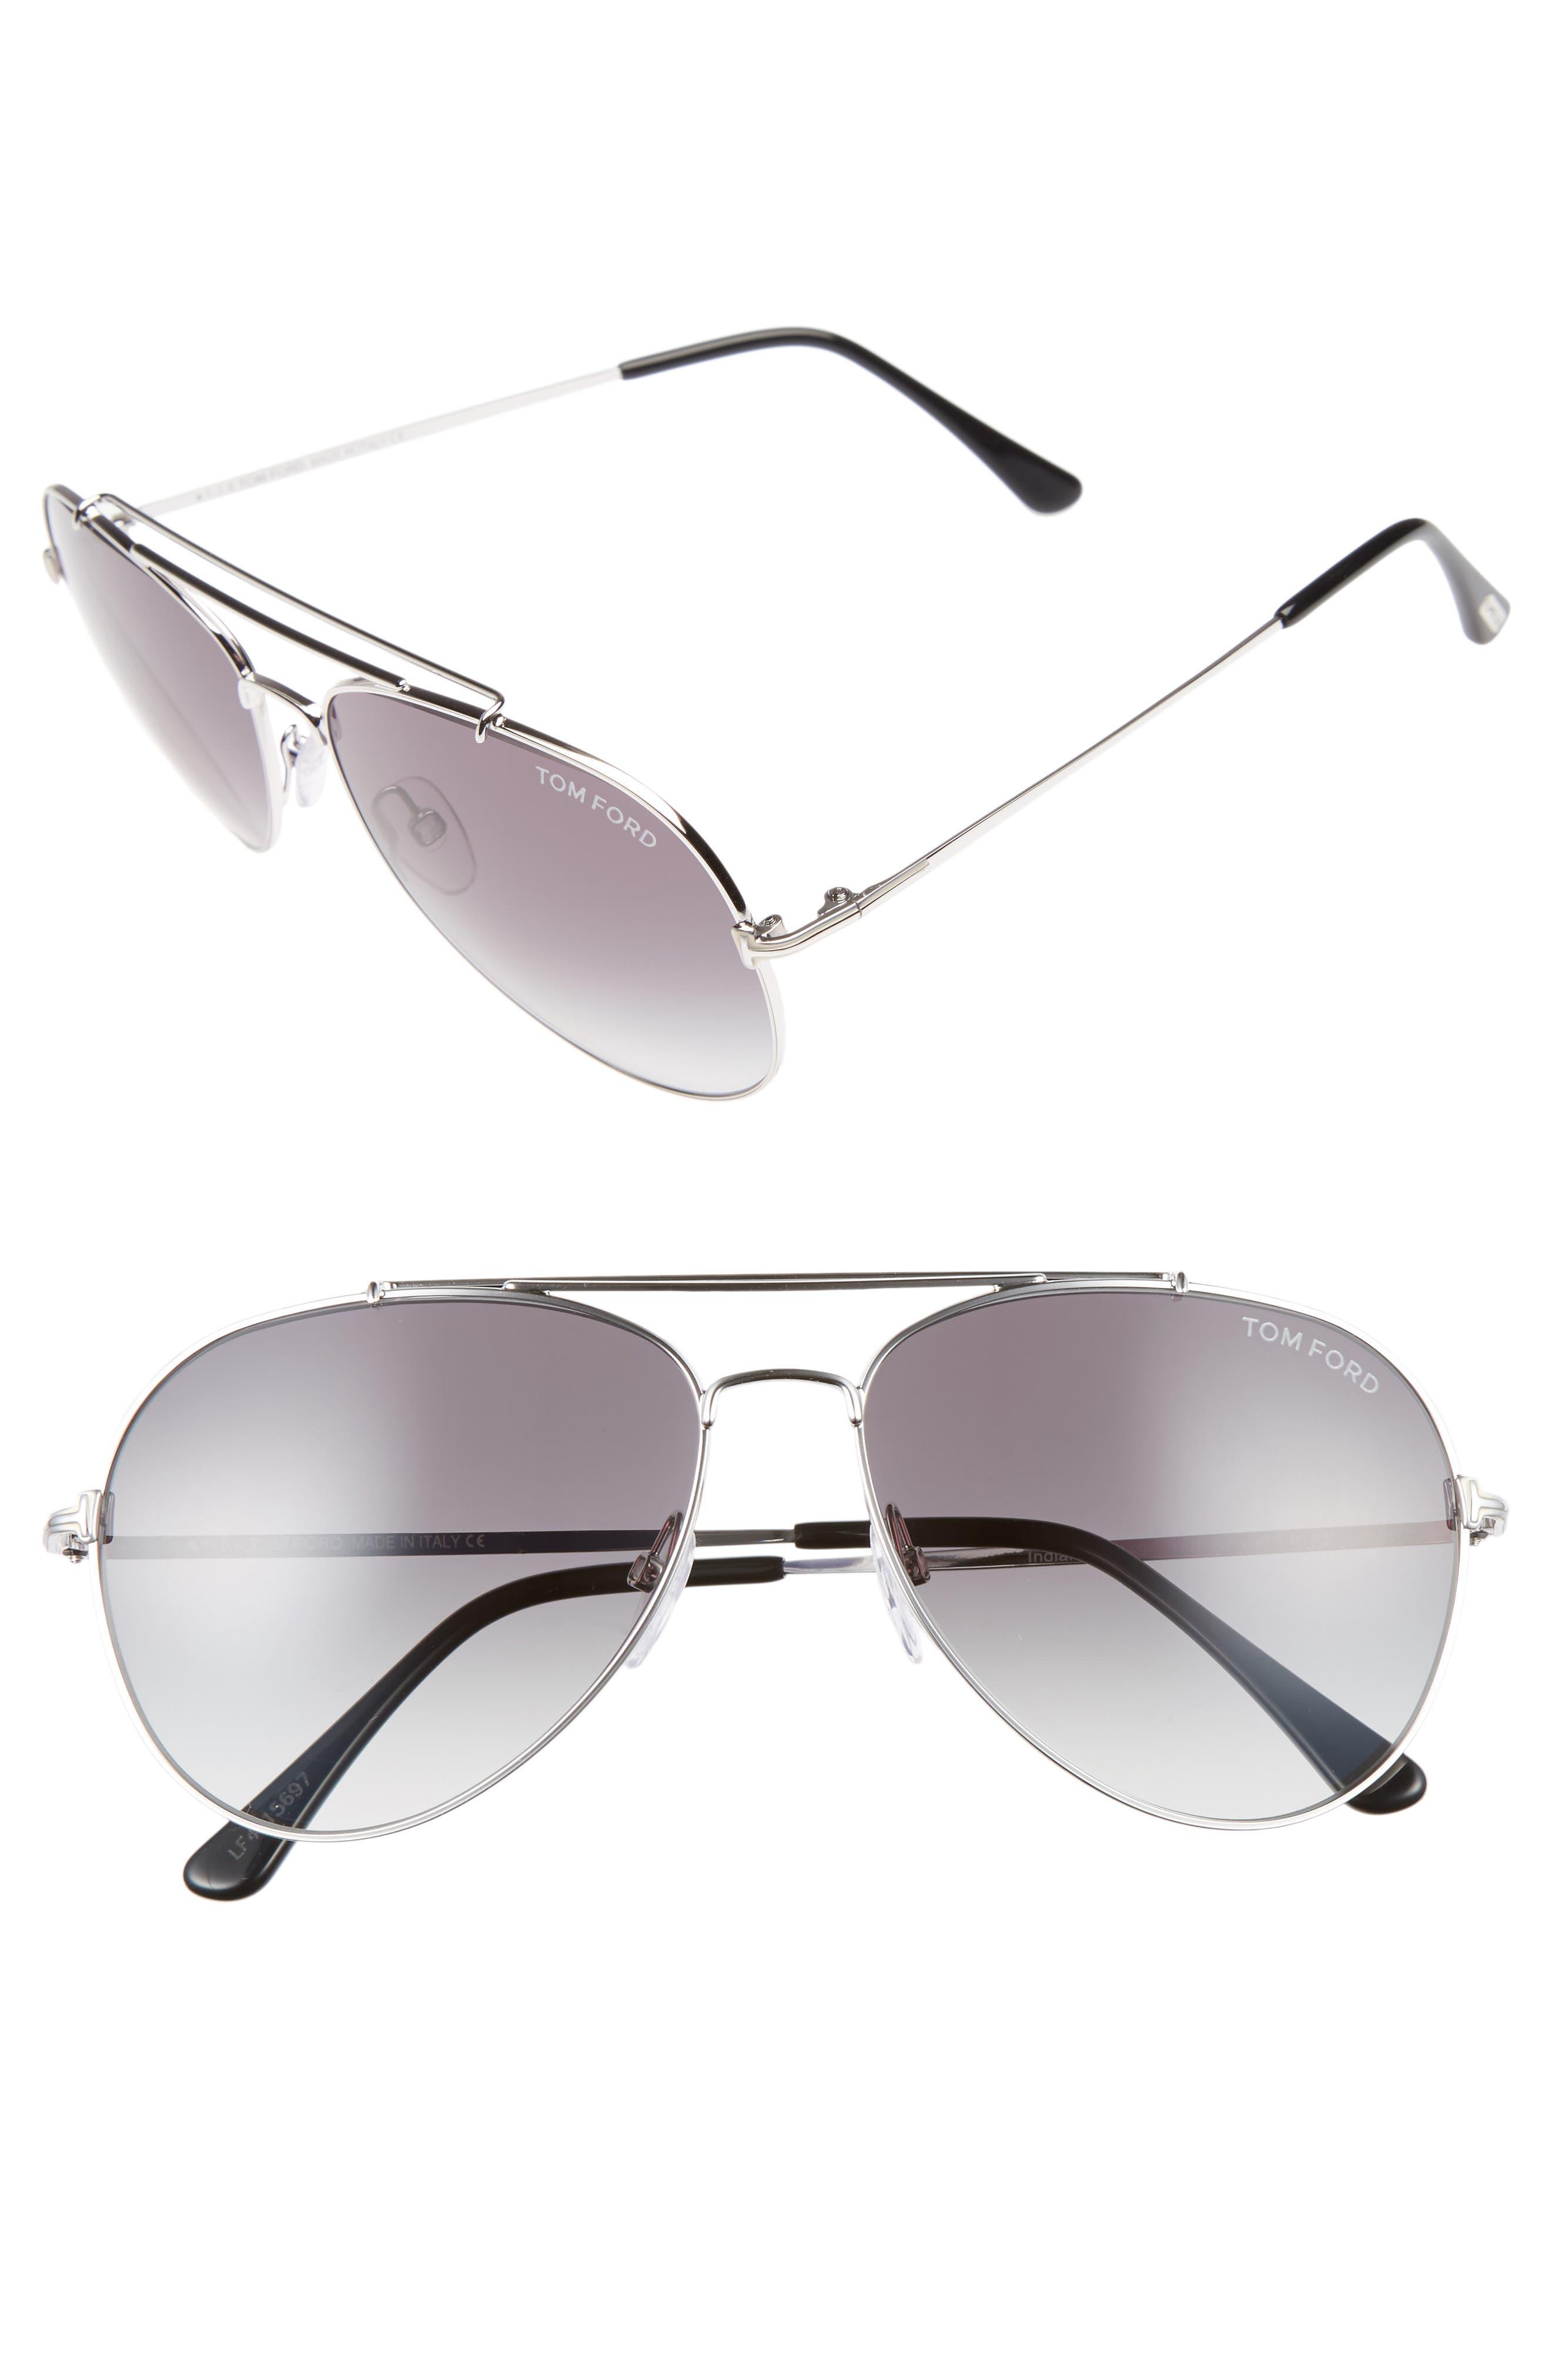 Indiana 60mm Aviator Sunglasses,                             Main thumbnail 1, color,                             041